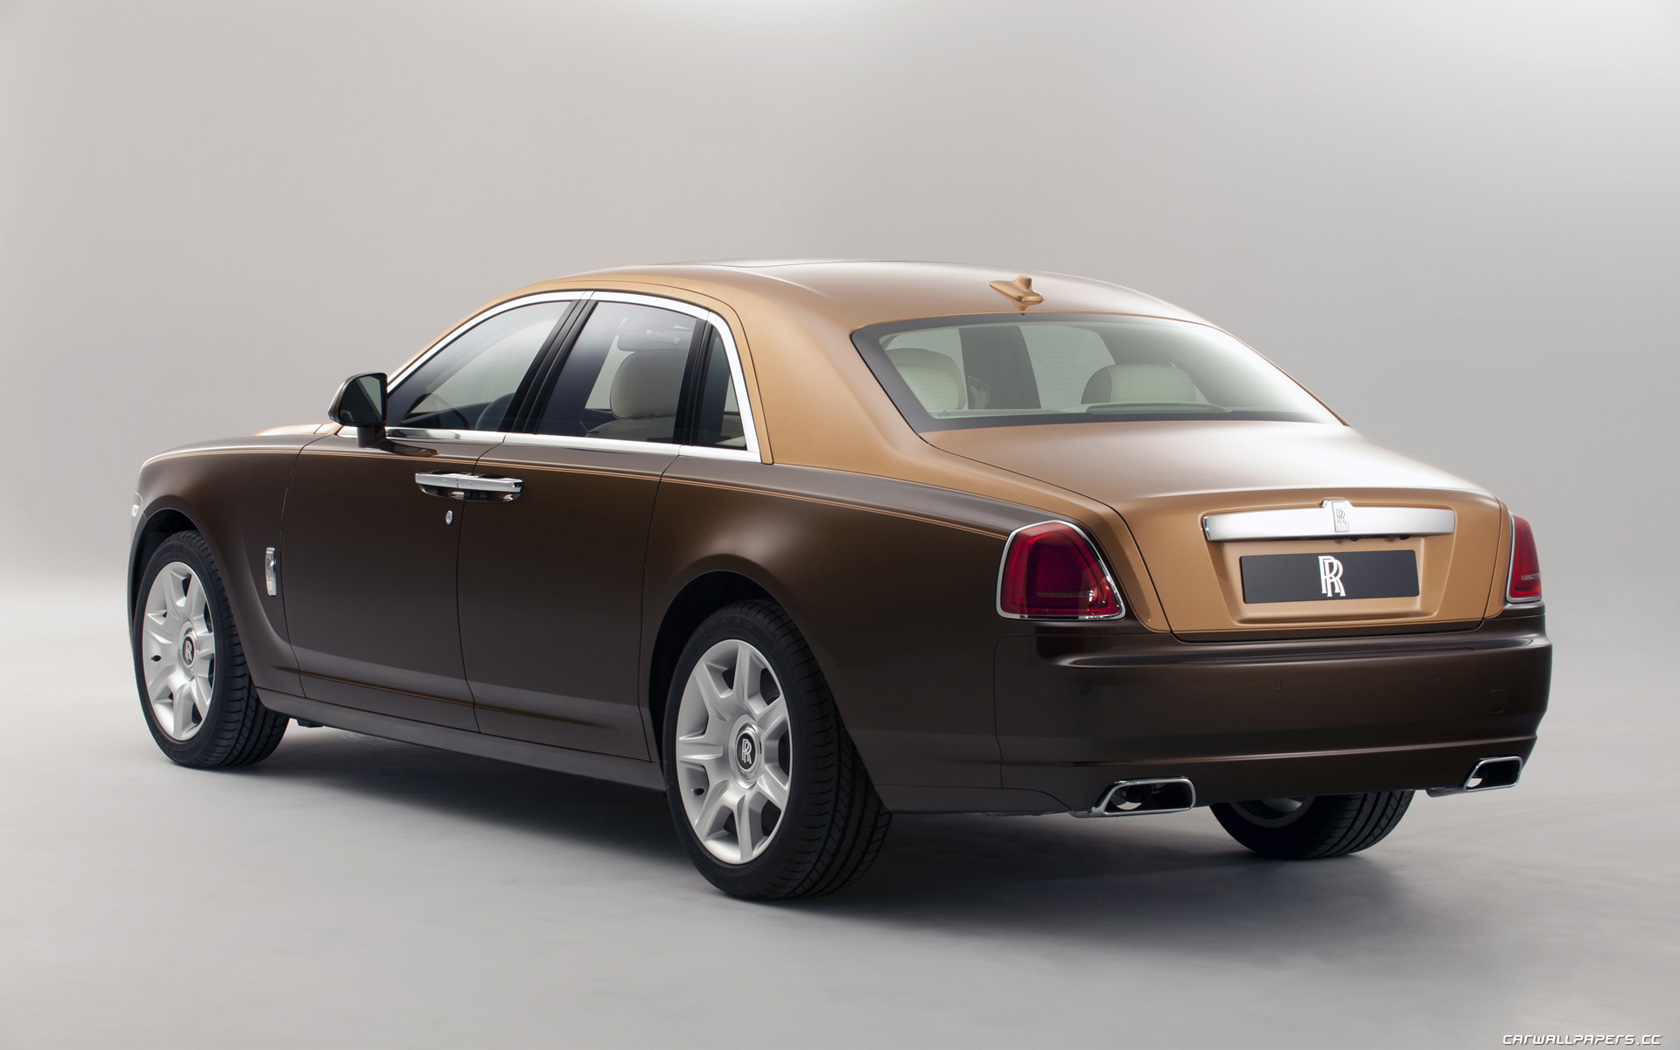 Rolls-Royce Cars 17 High Resolution Wallpaper